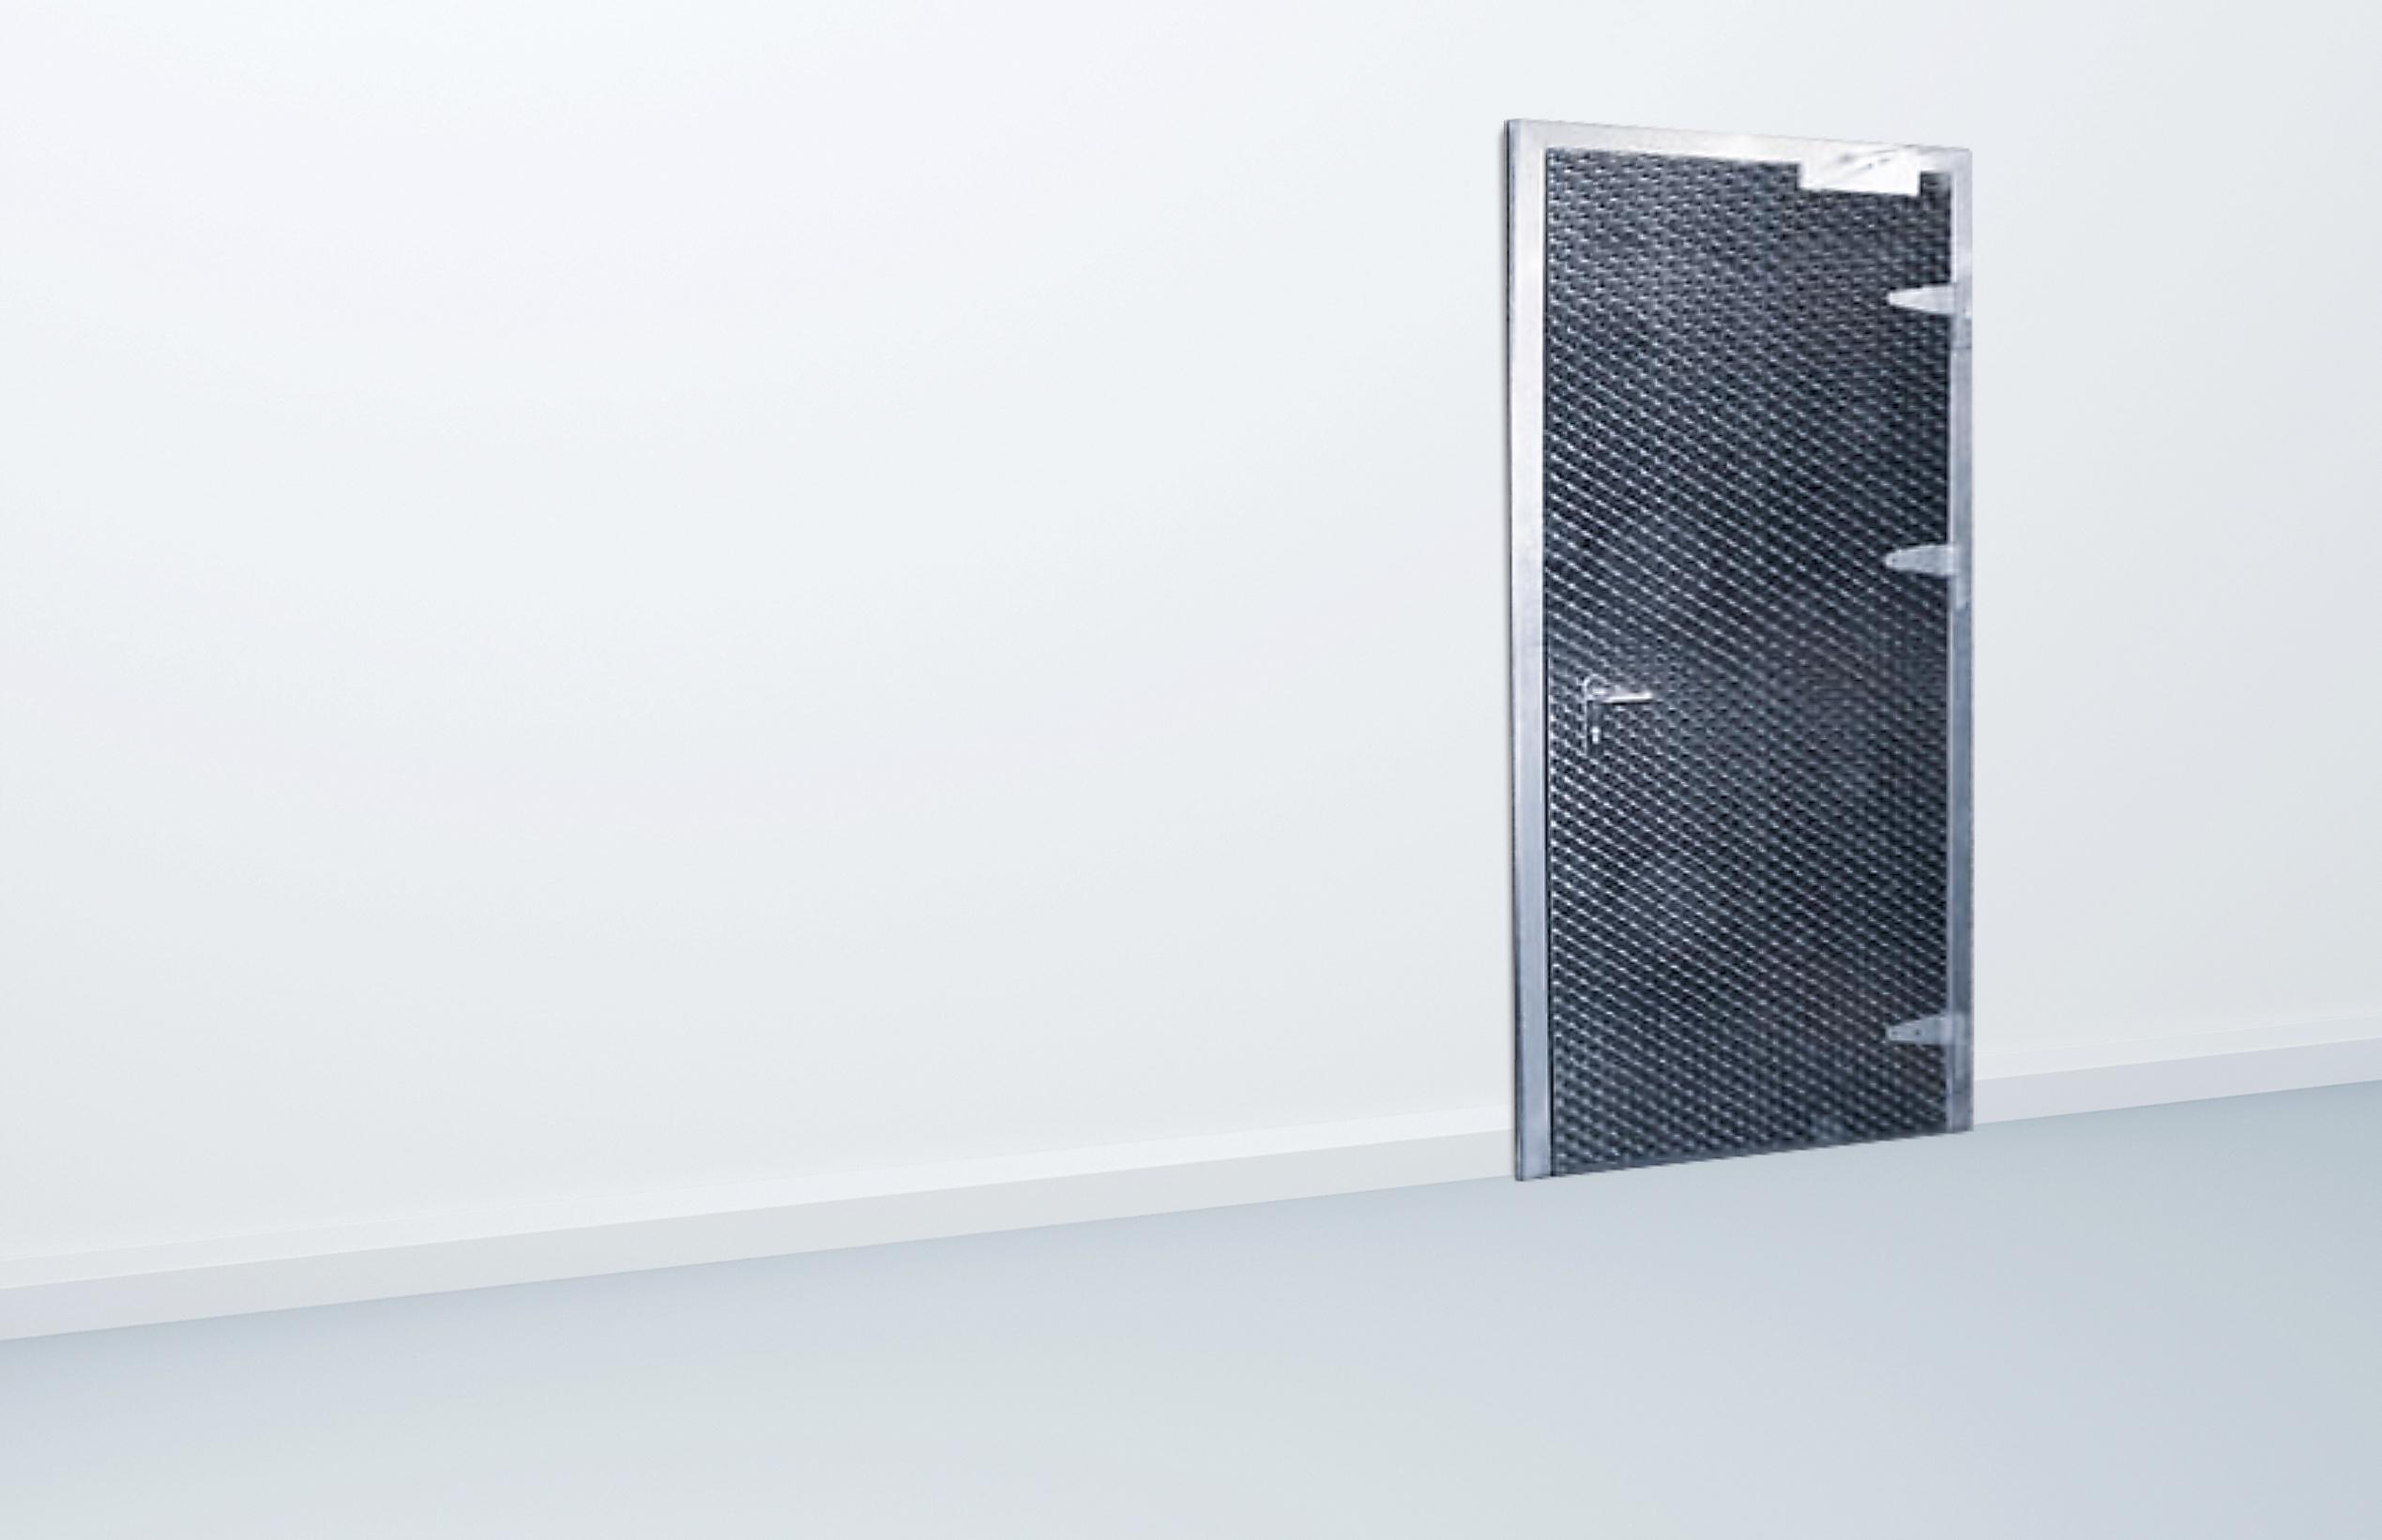 Brandsikret dør til kølerum